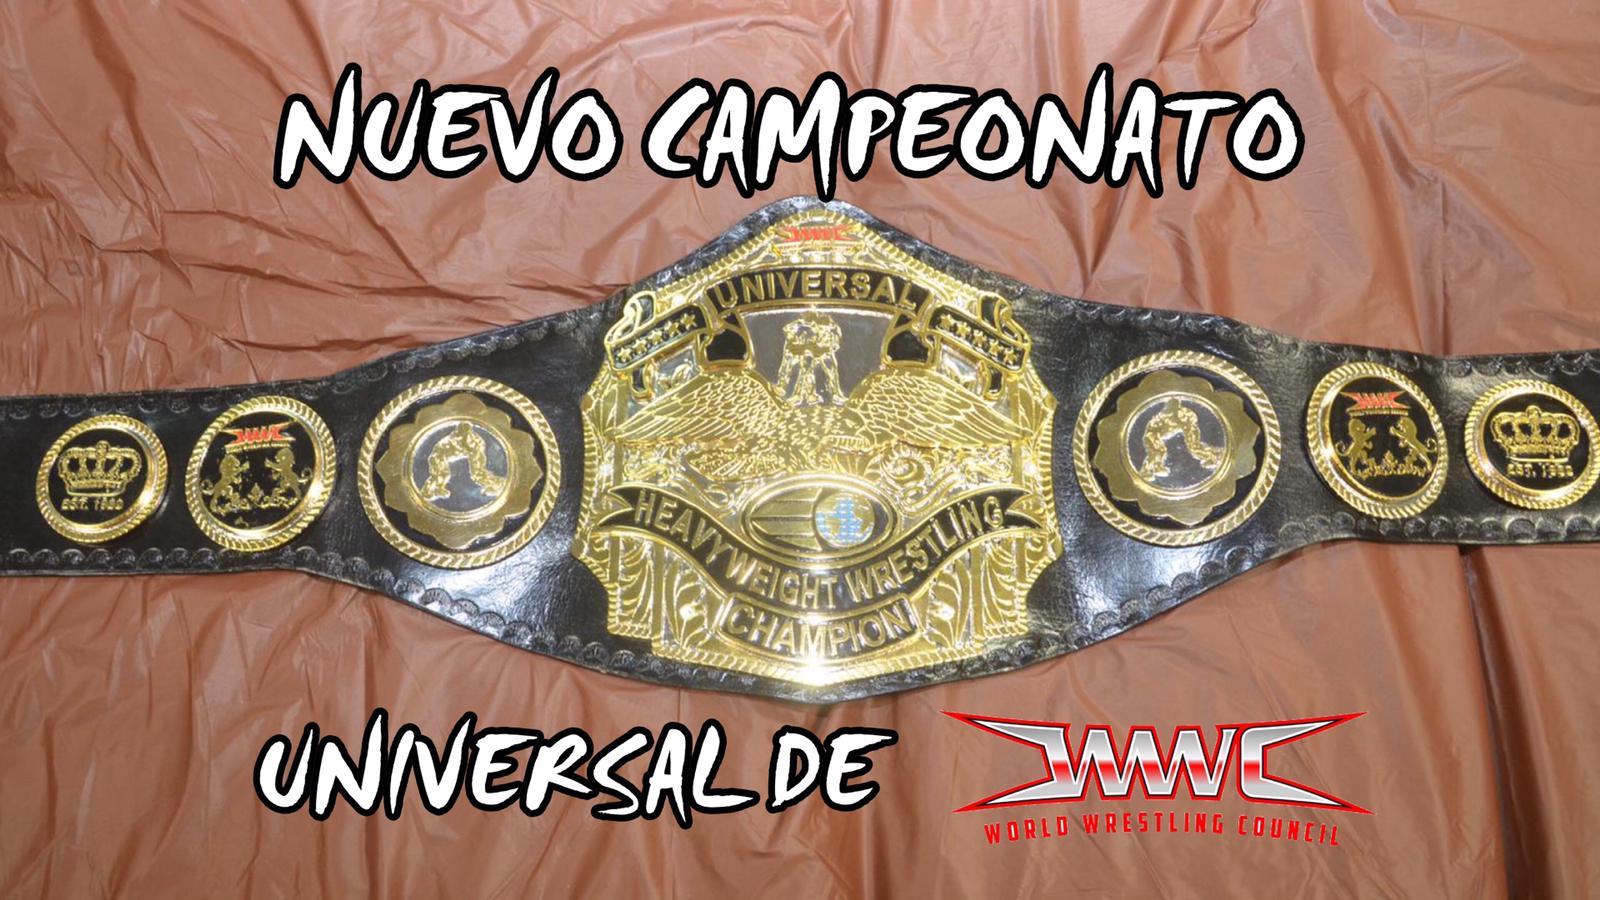 Video del nuevo Campeonato Universal de WWC 1